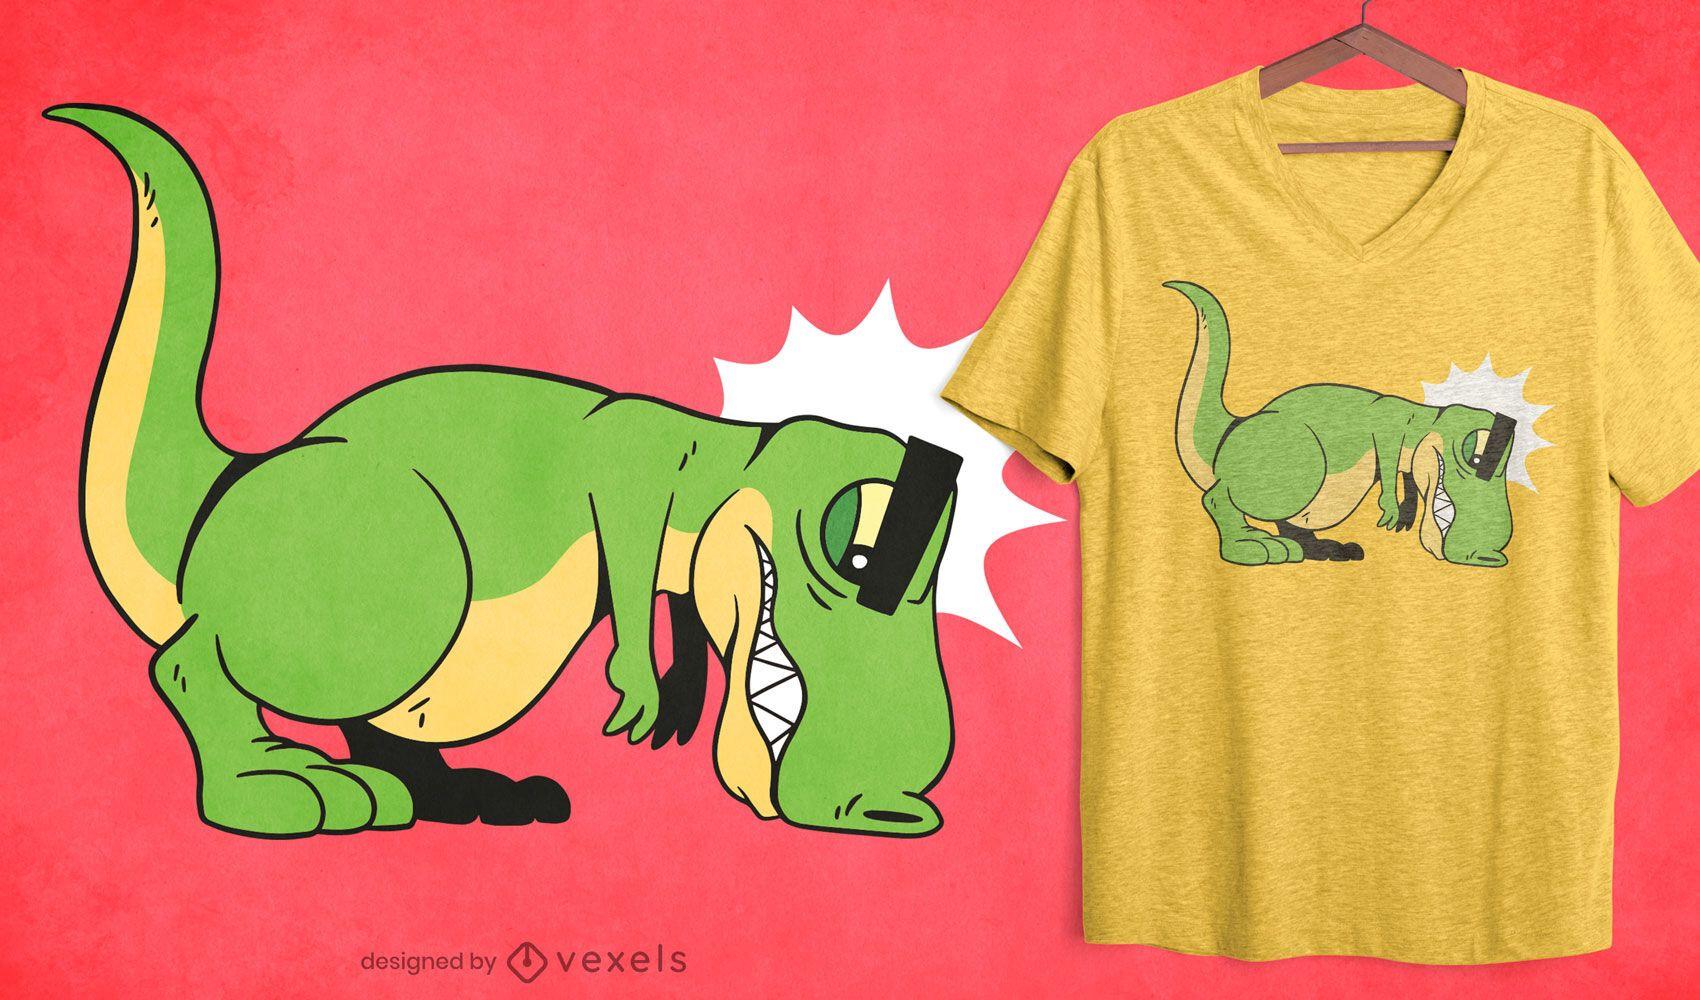 T-rex push ups t-shirt design